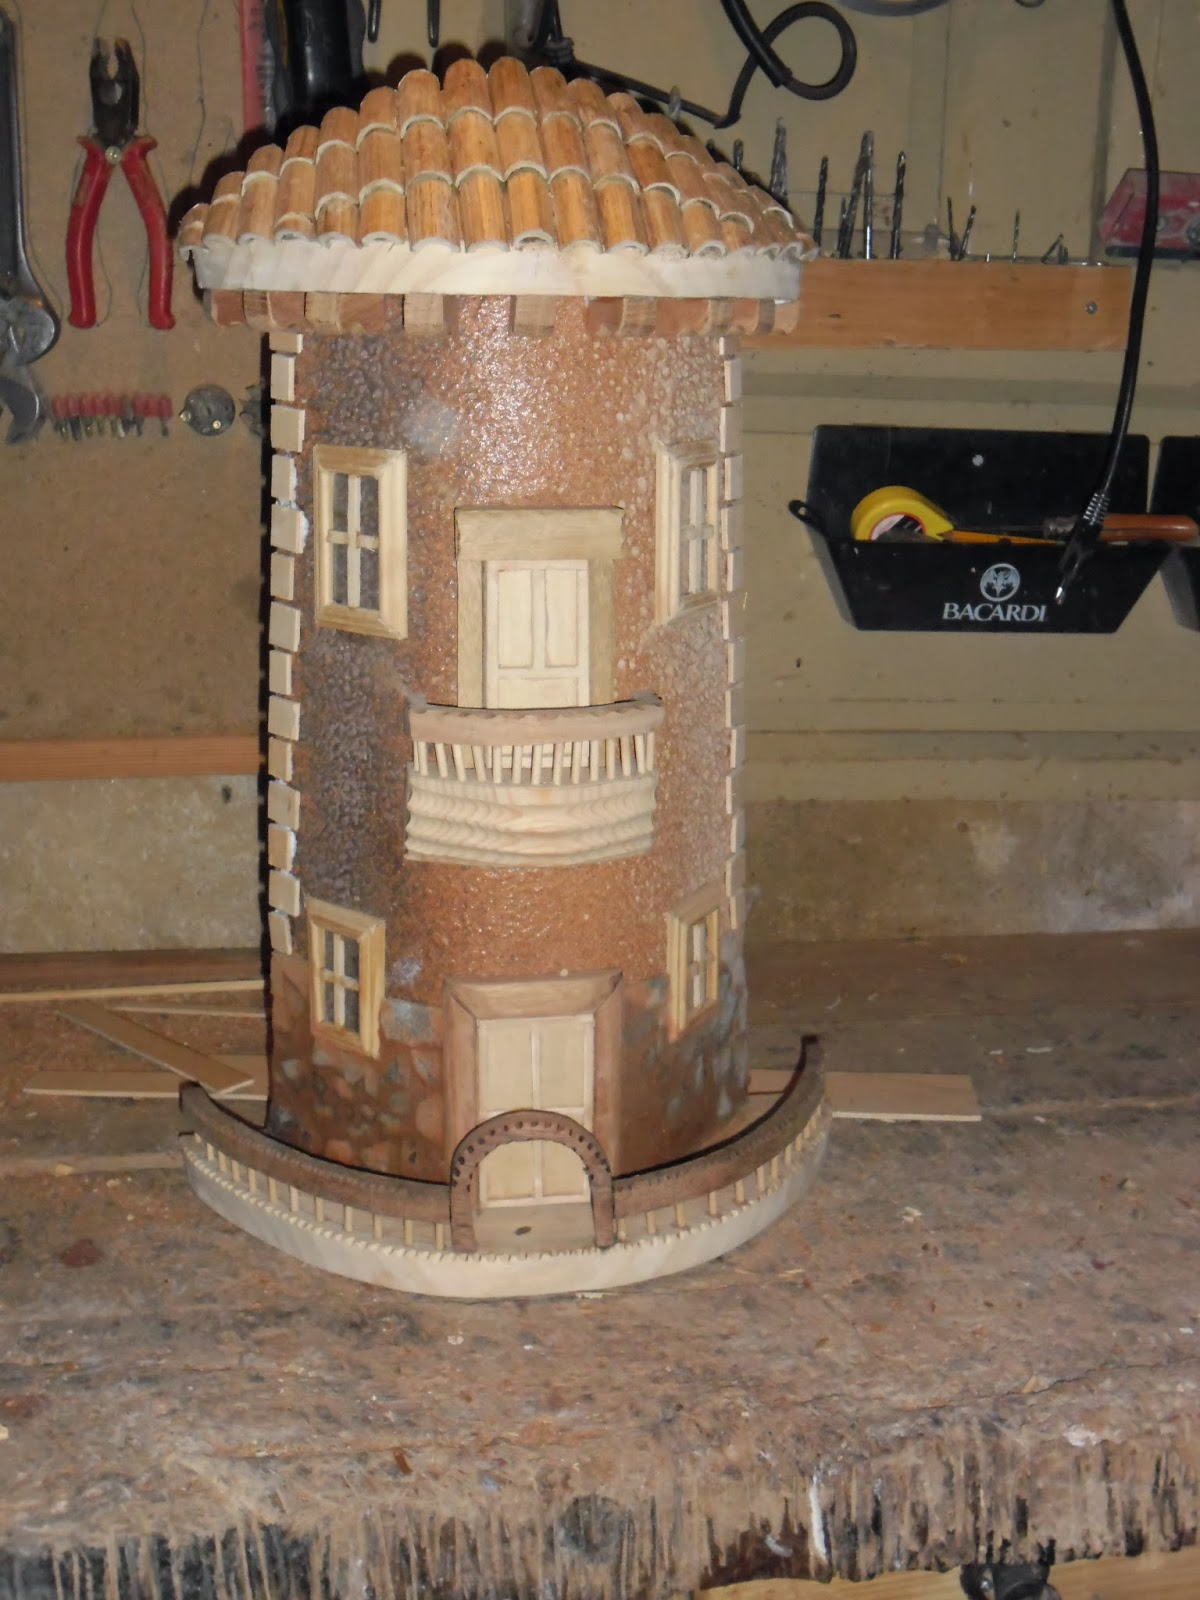 Muebles hechos con piques obtenga ideas dise o de for Cosas hechas de madera